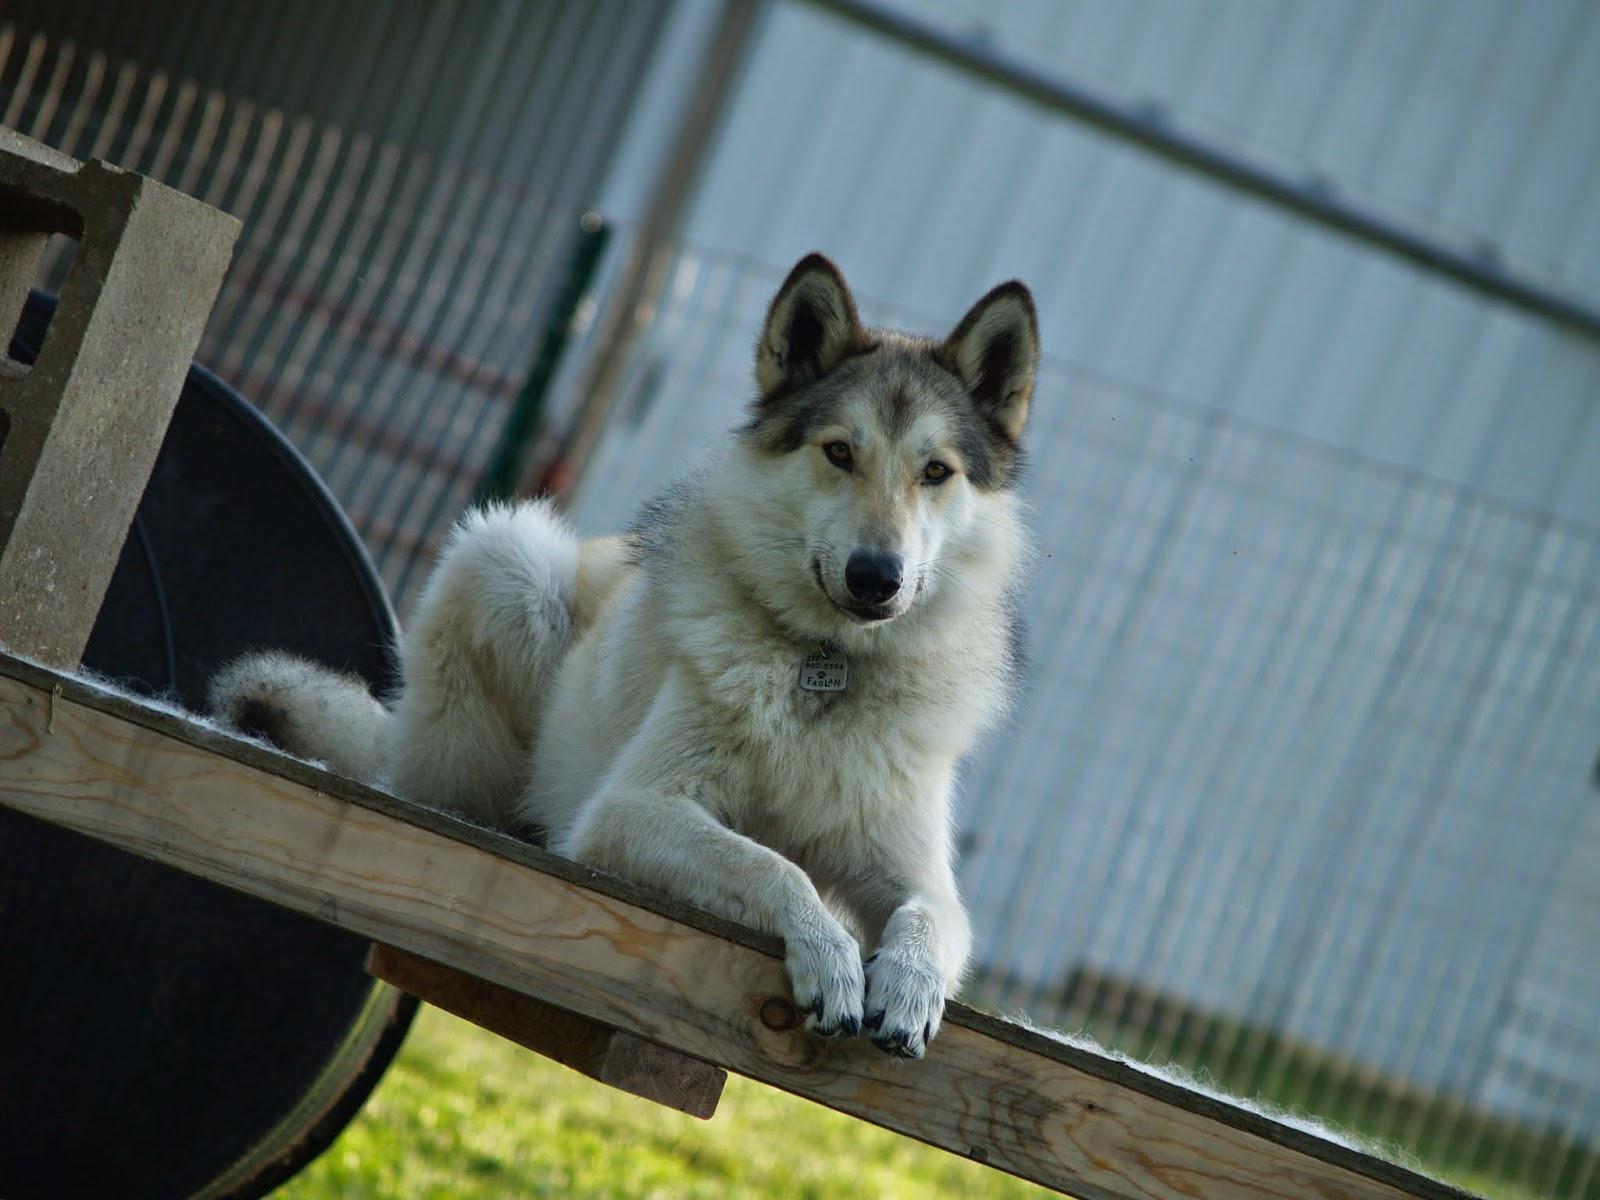 wolfdog prey drive, mid content wolfdog